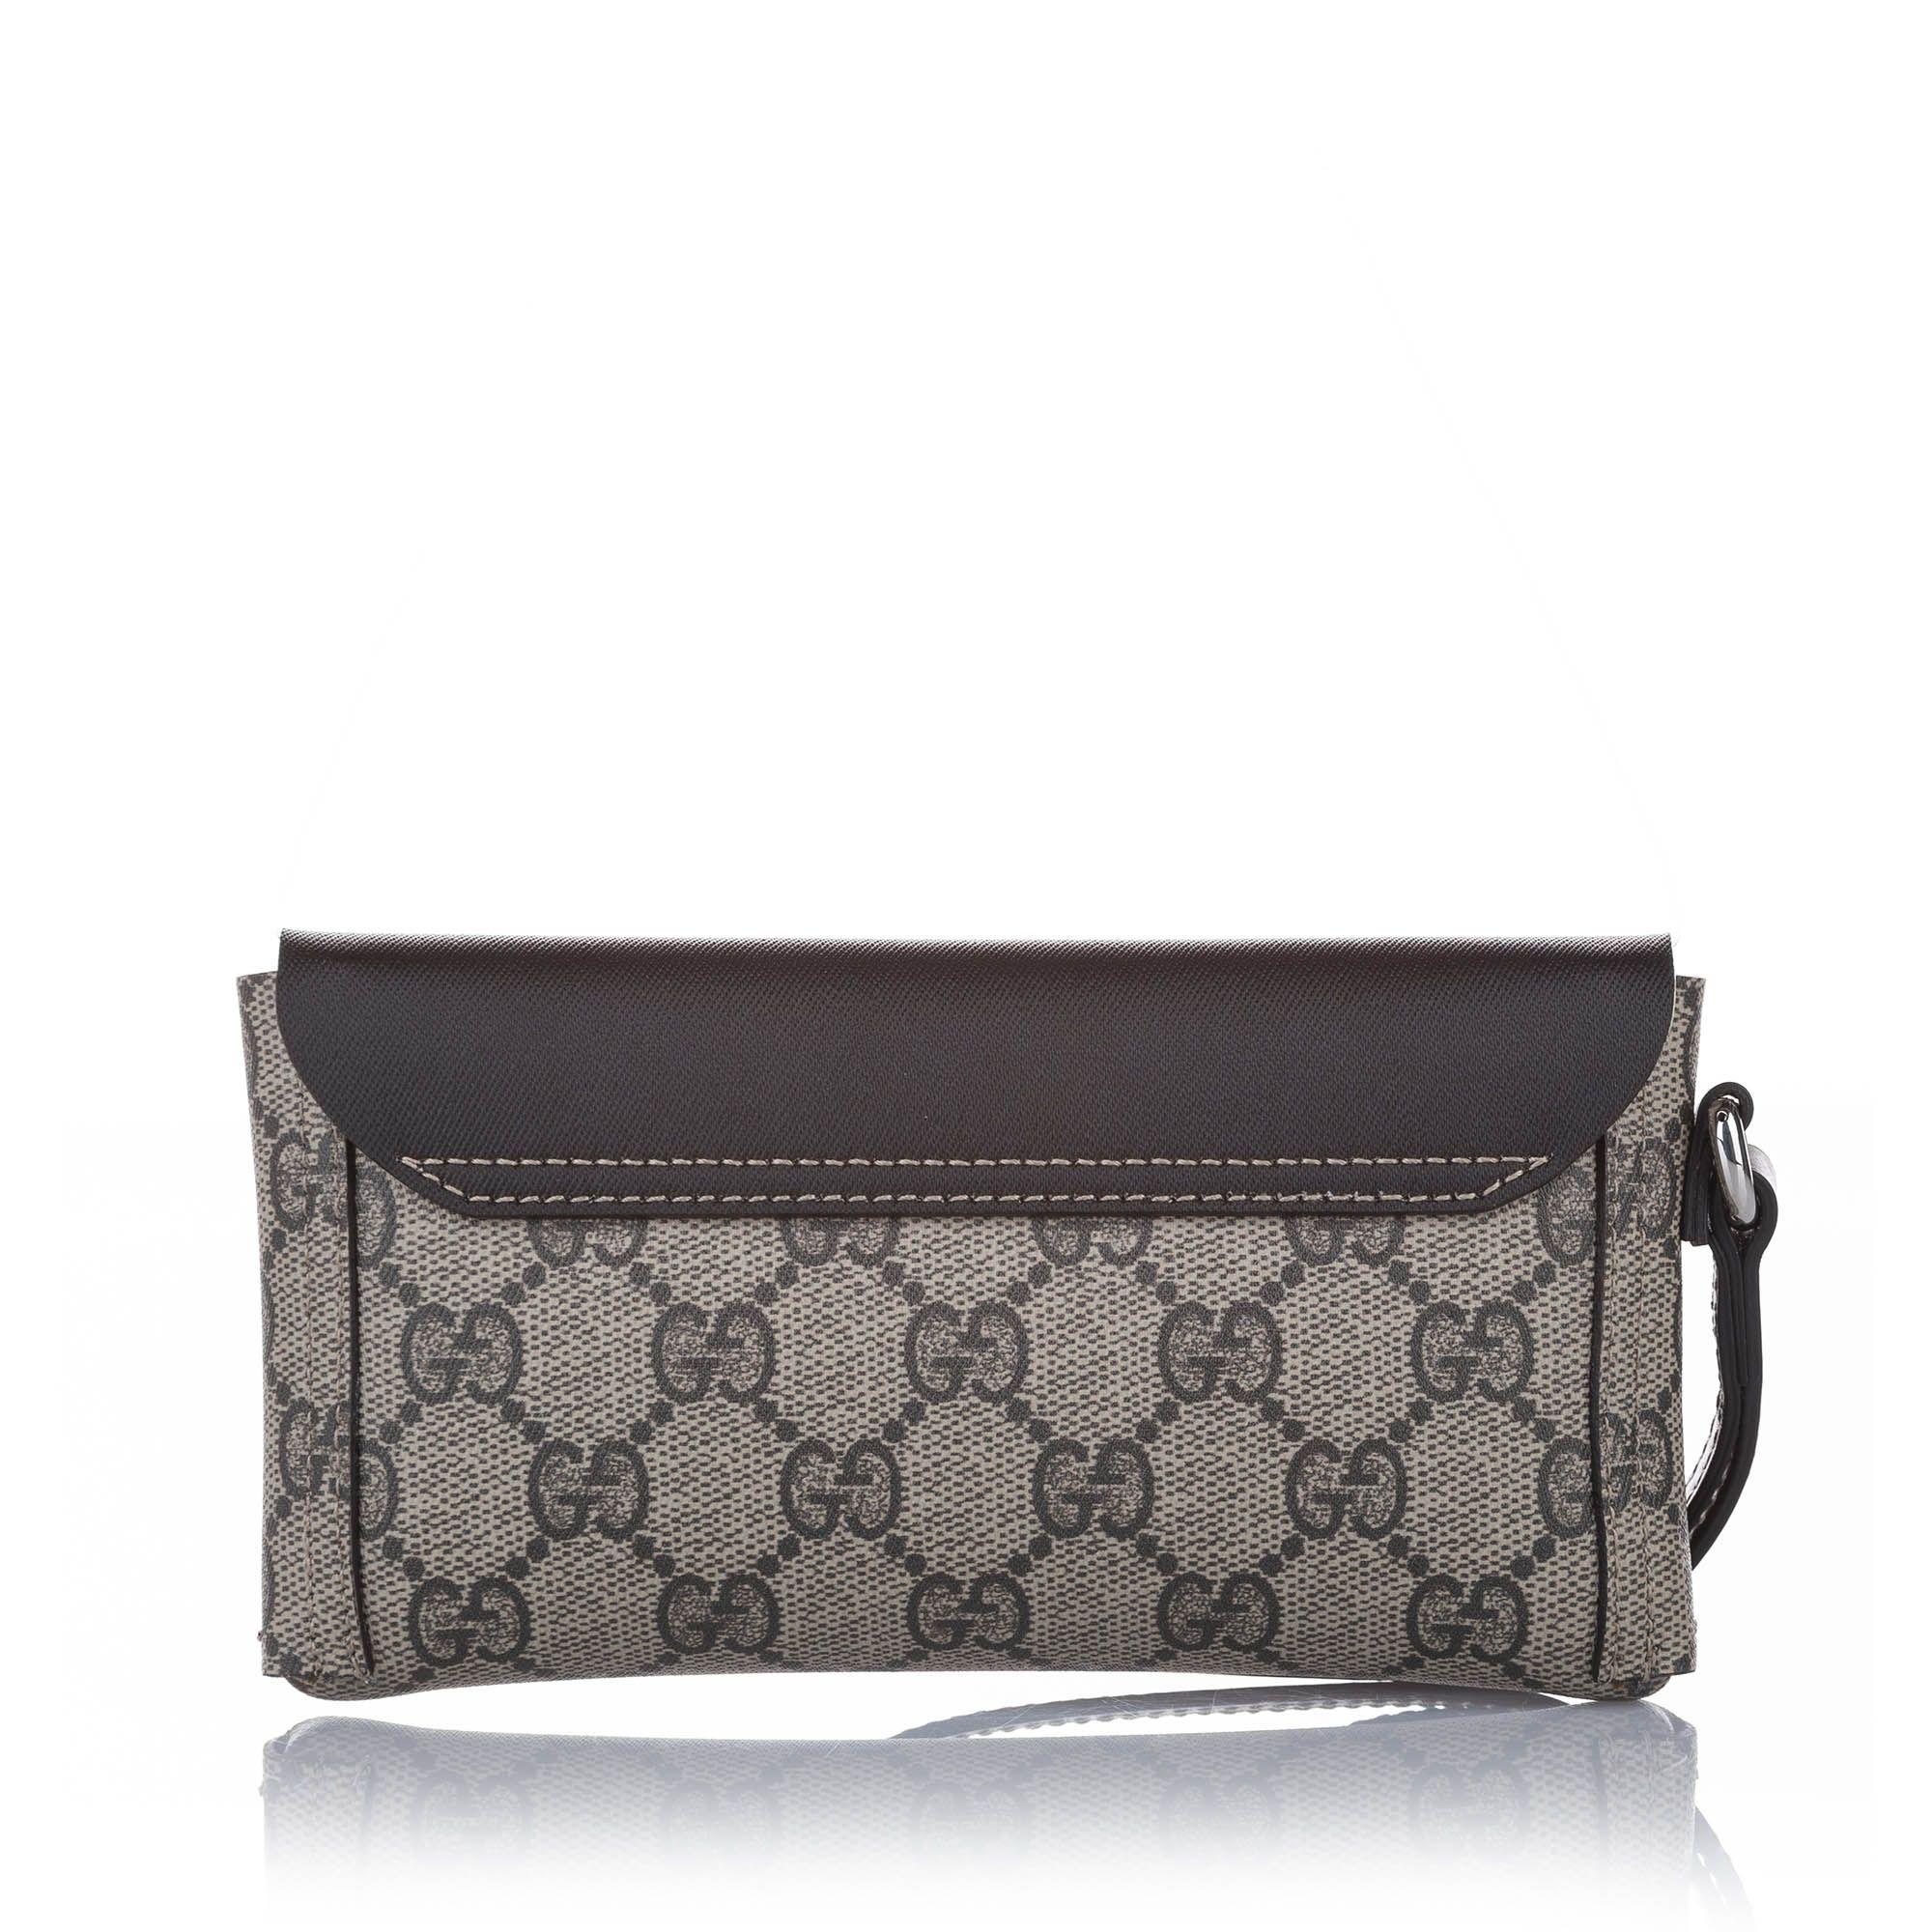 Vintage Gucci GG Supreme Clutch Bag Brown